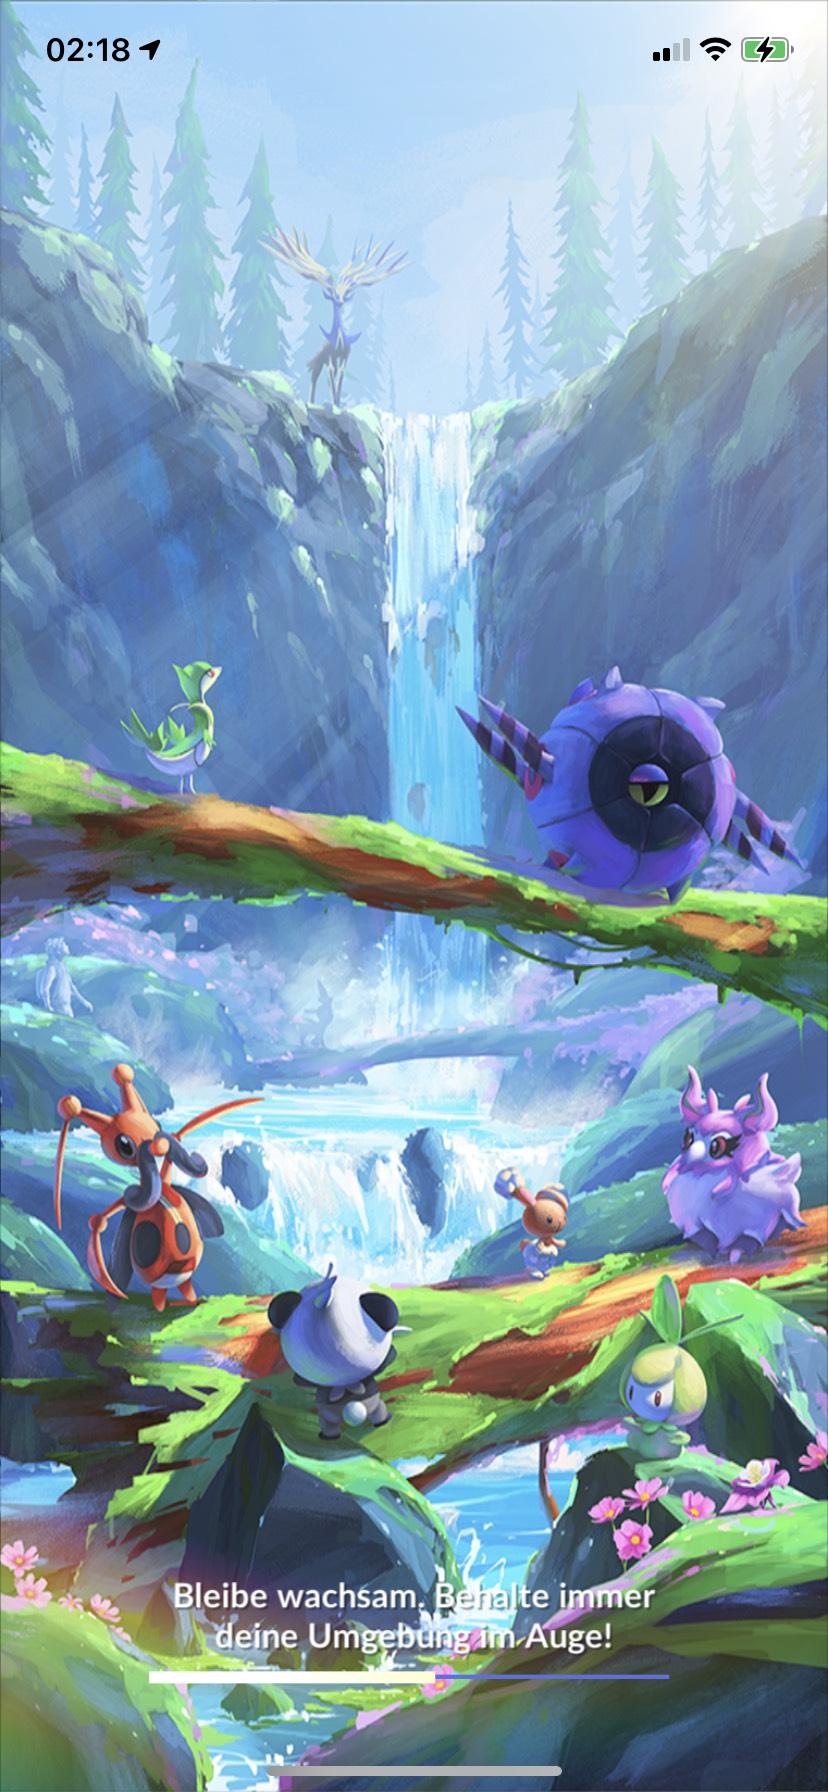 30x Hyperball kostenlos Pokémon Go / Serpifeu Community Day